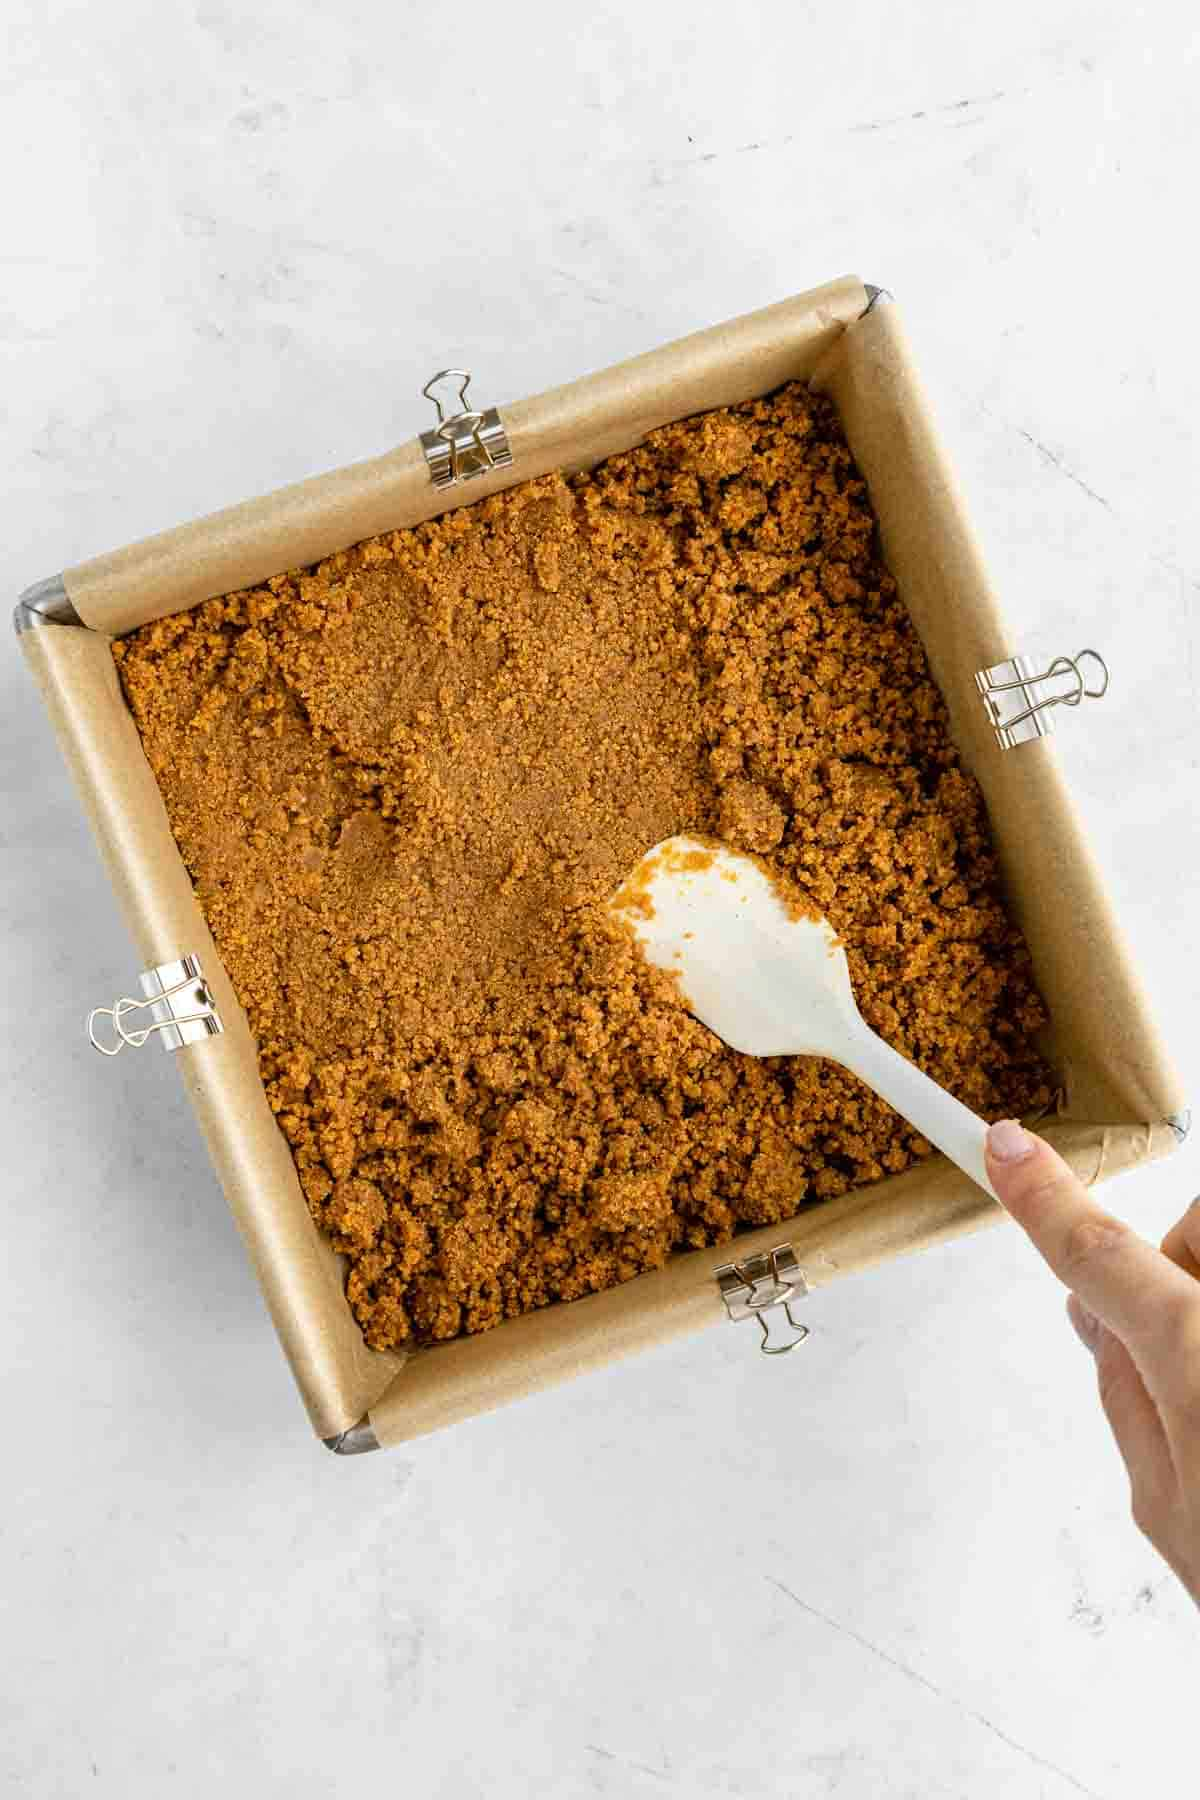 a spatula pressing graham cracker crust into a square baking dish